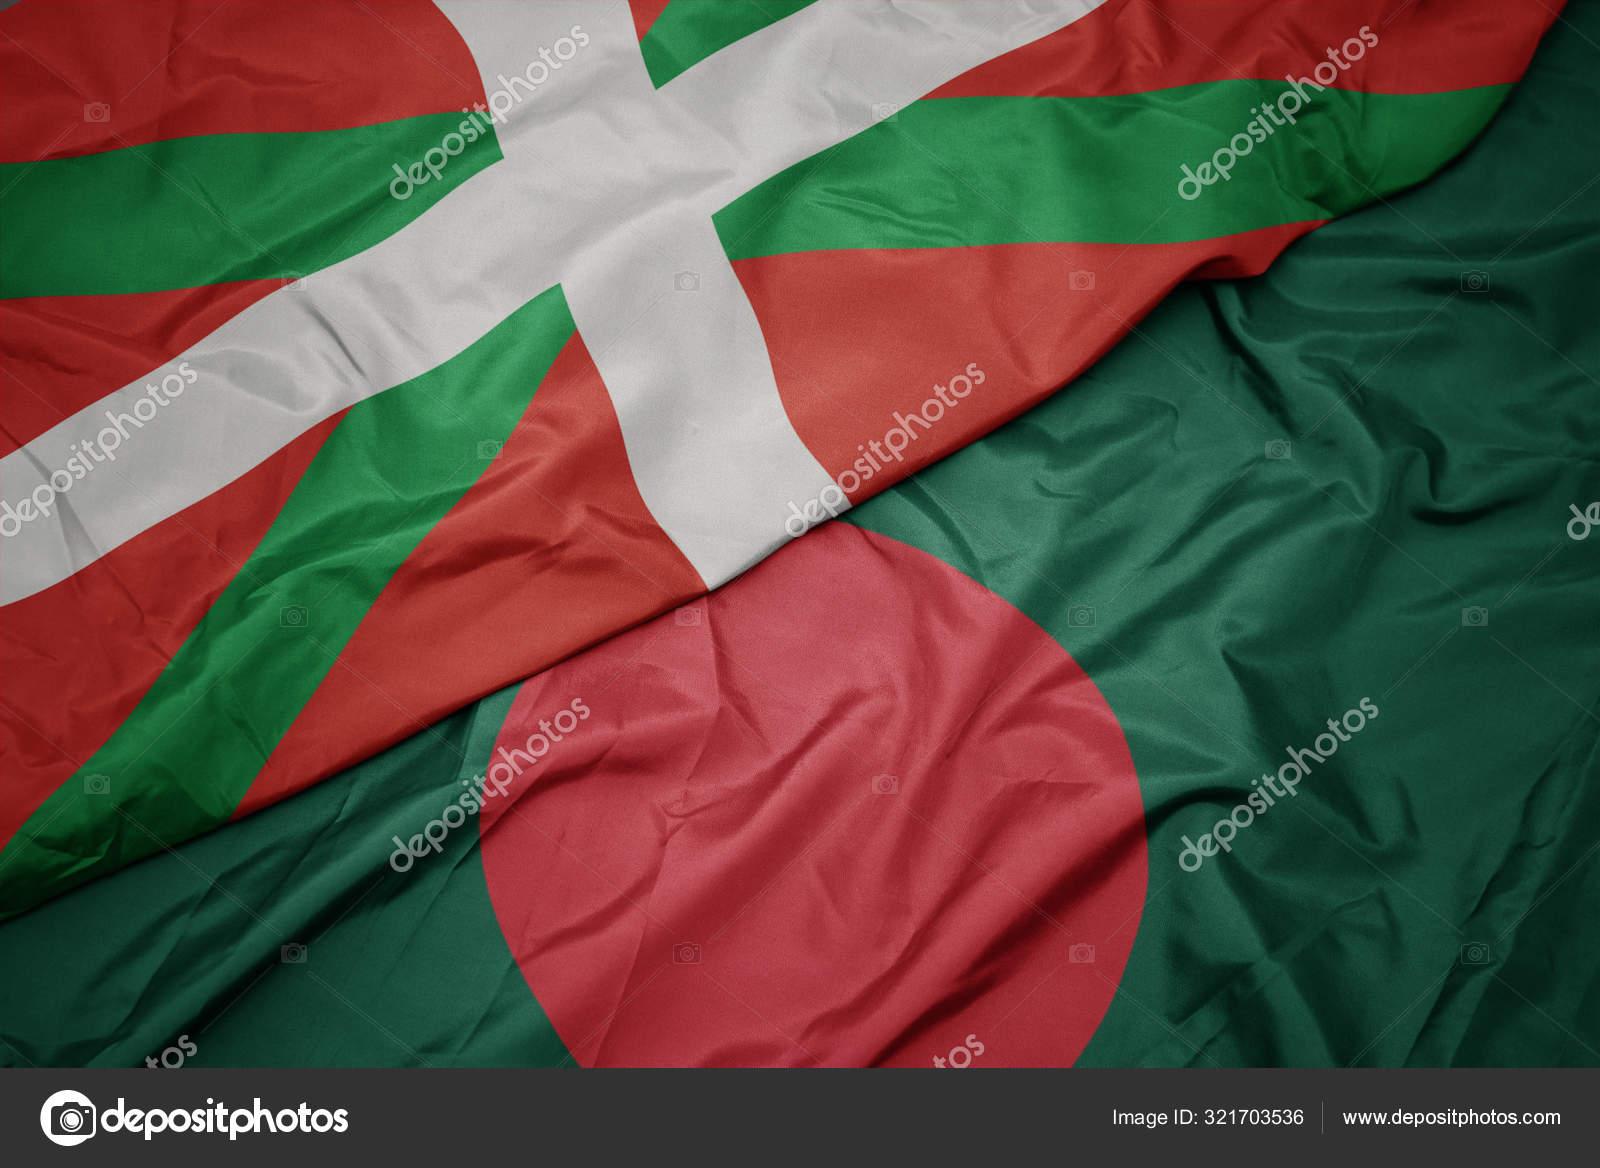 развитие было страна басков флаг фото раздел объявления